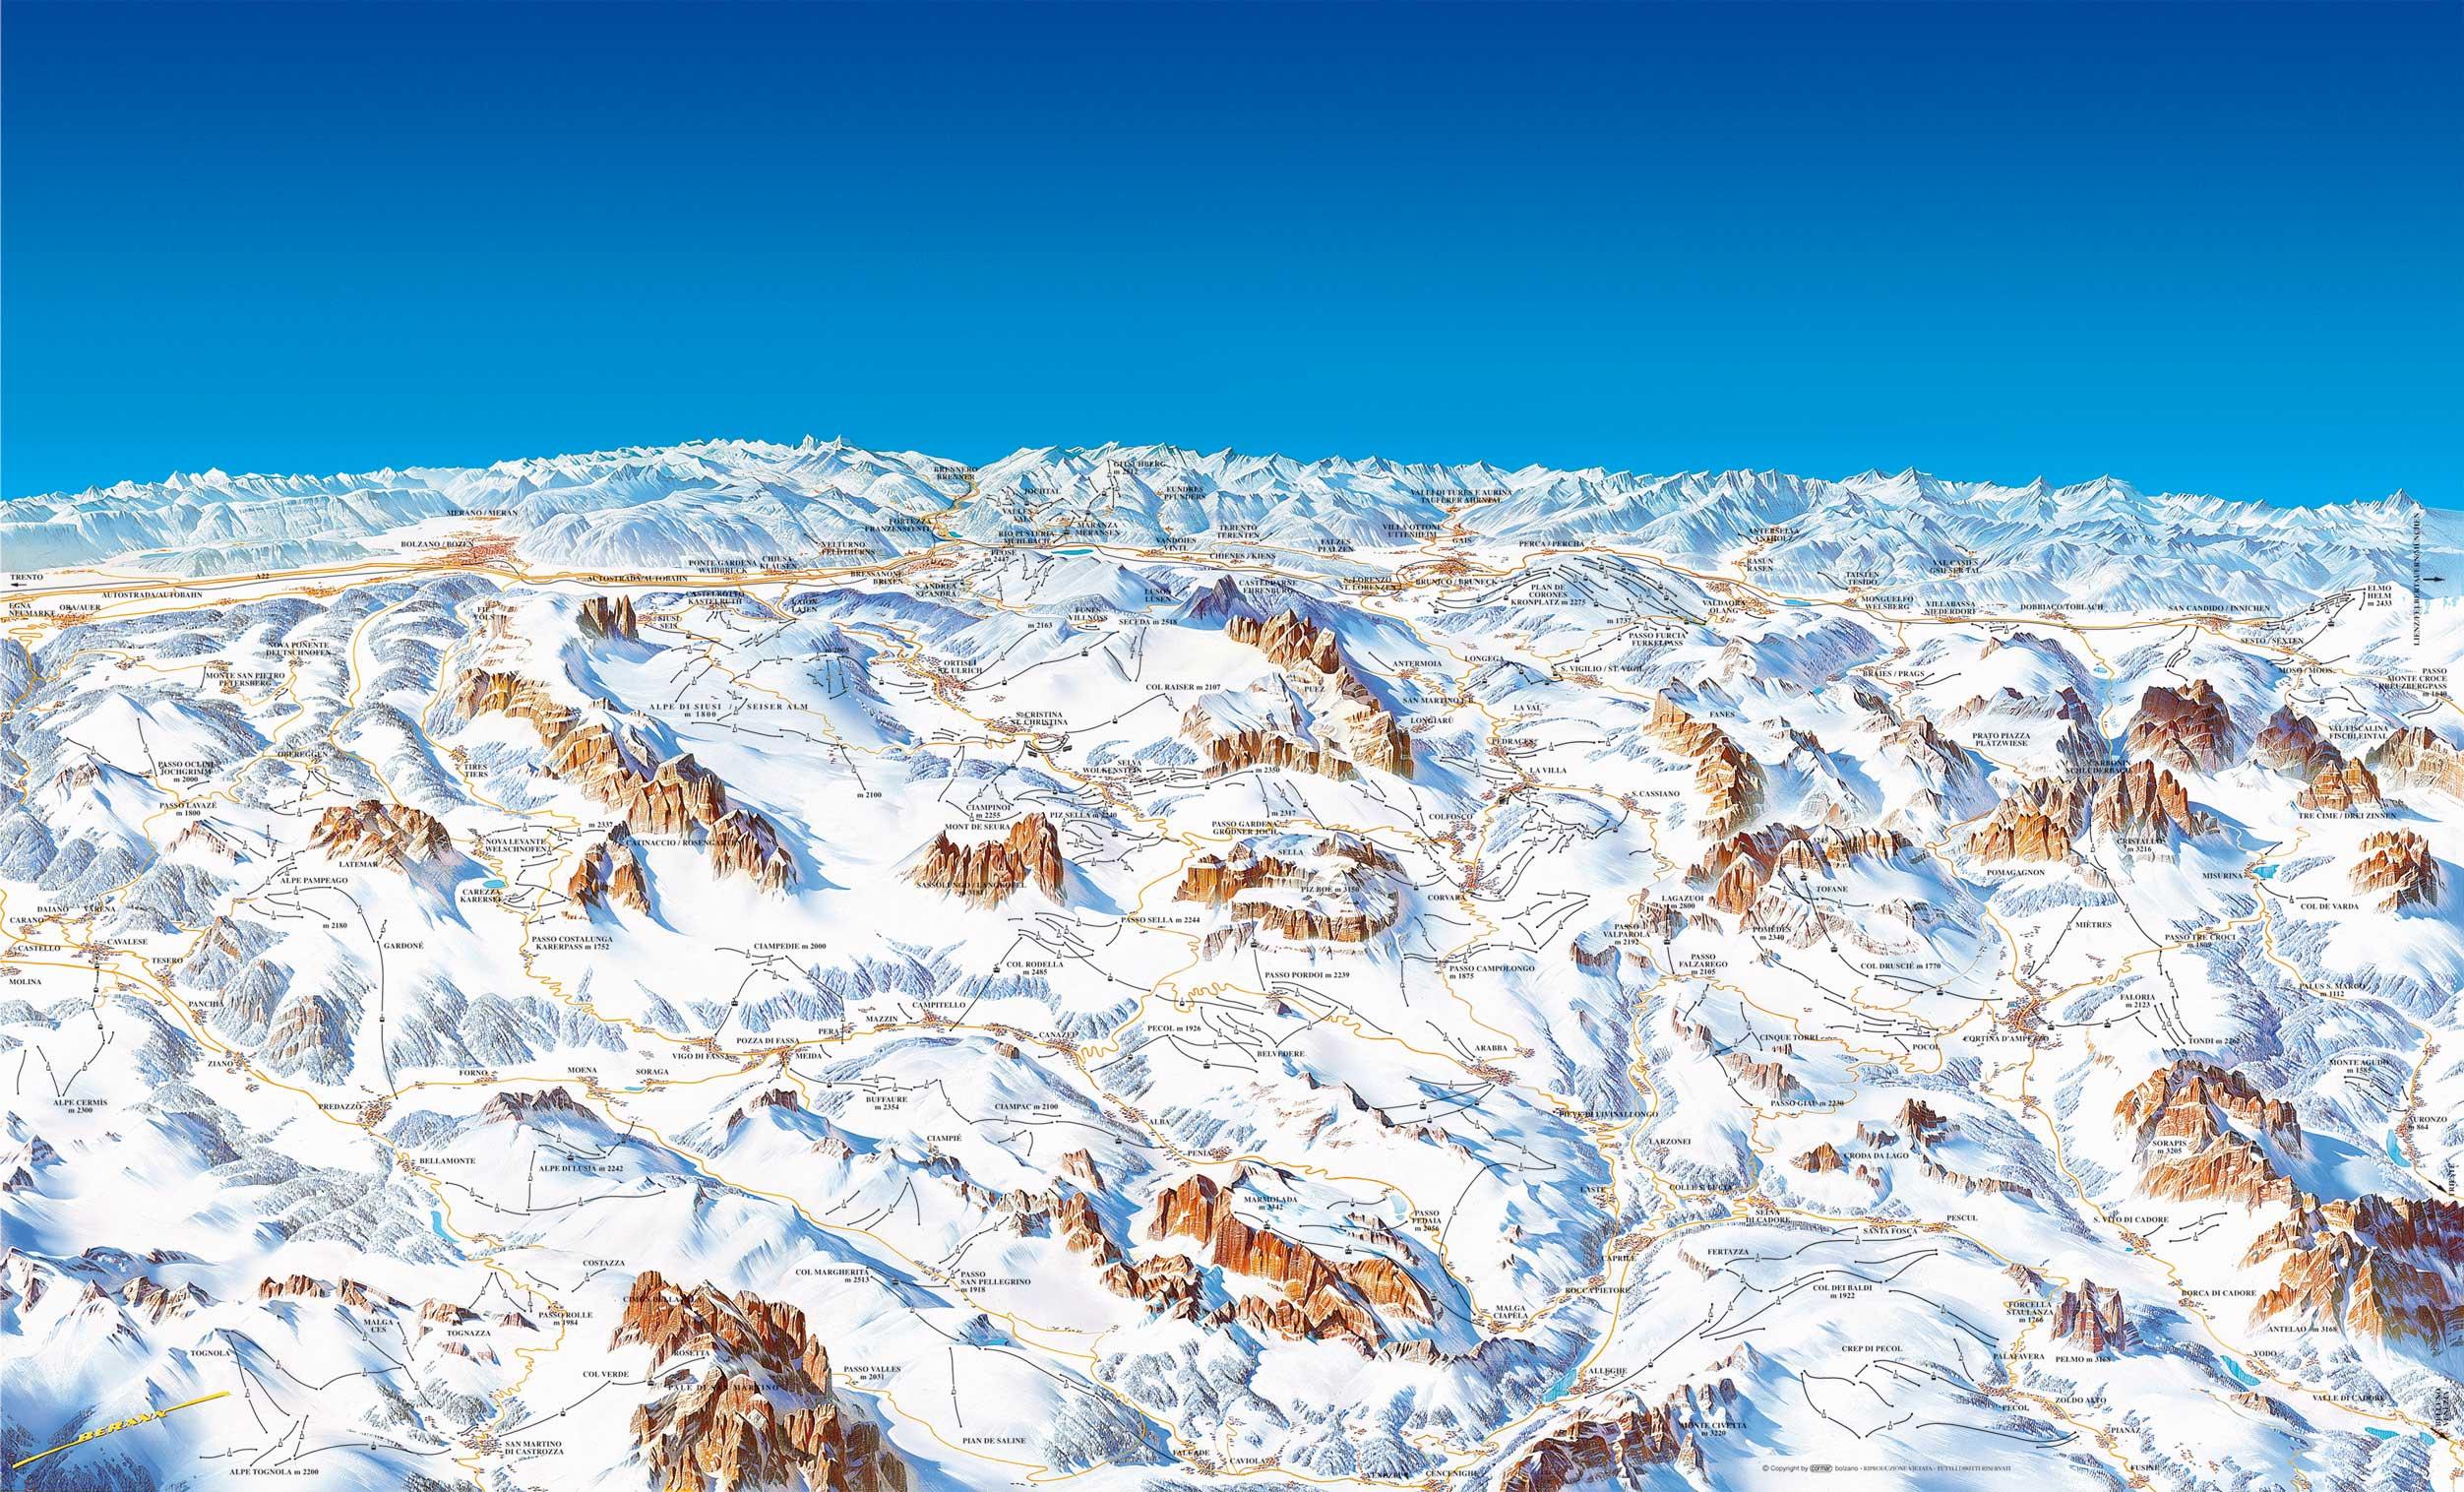 Cartina 3d Dolomiti.Cartina Piste Dolomiti Superski Skimap Dolomiti Superski Dove Sciare